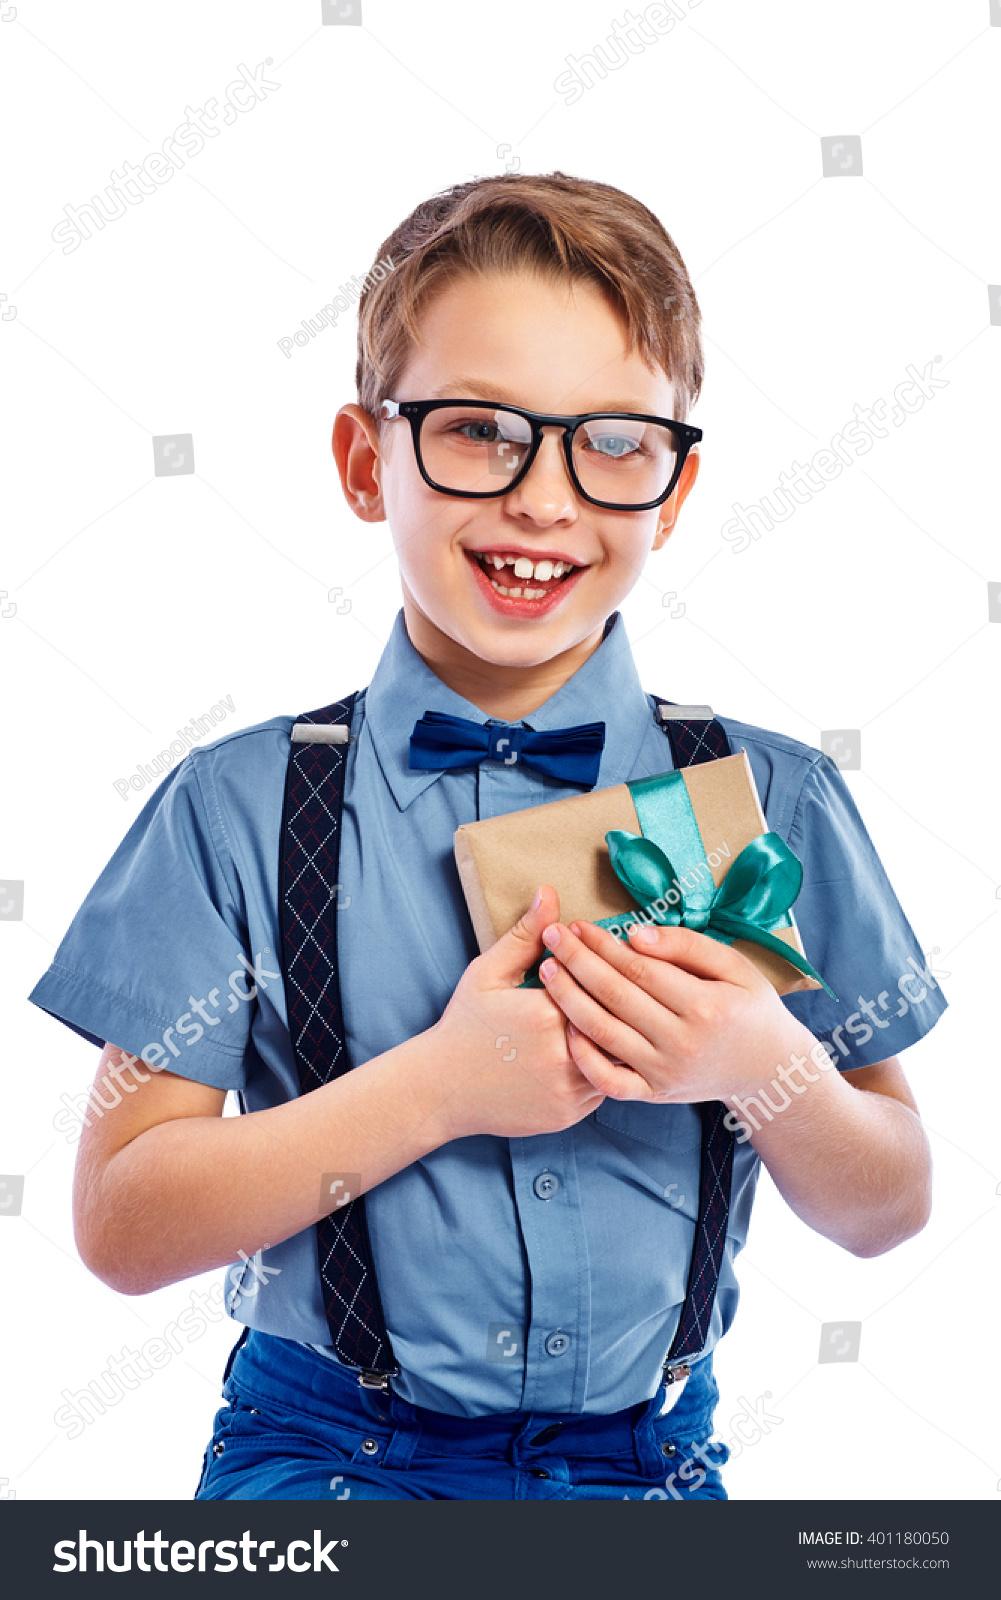 Small boy stylish exclusive photo